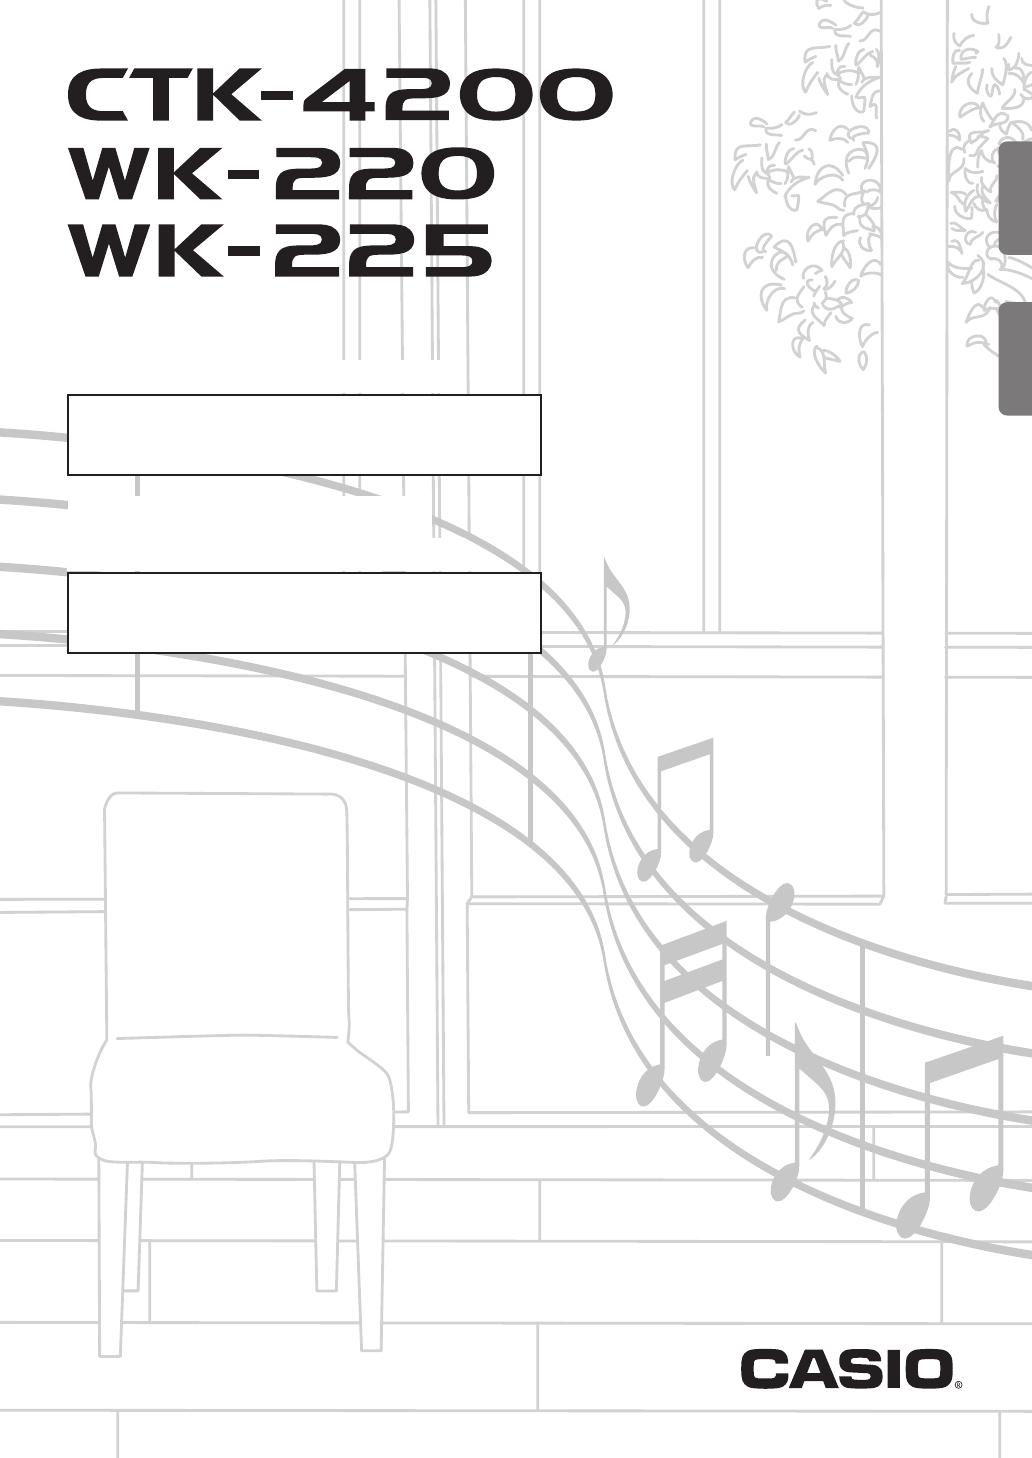 Casio CTK4200_WK220_WK225_s CTK4200_WK220 CTK4200 WK220 ES